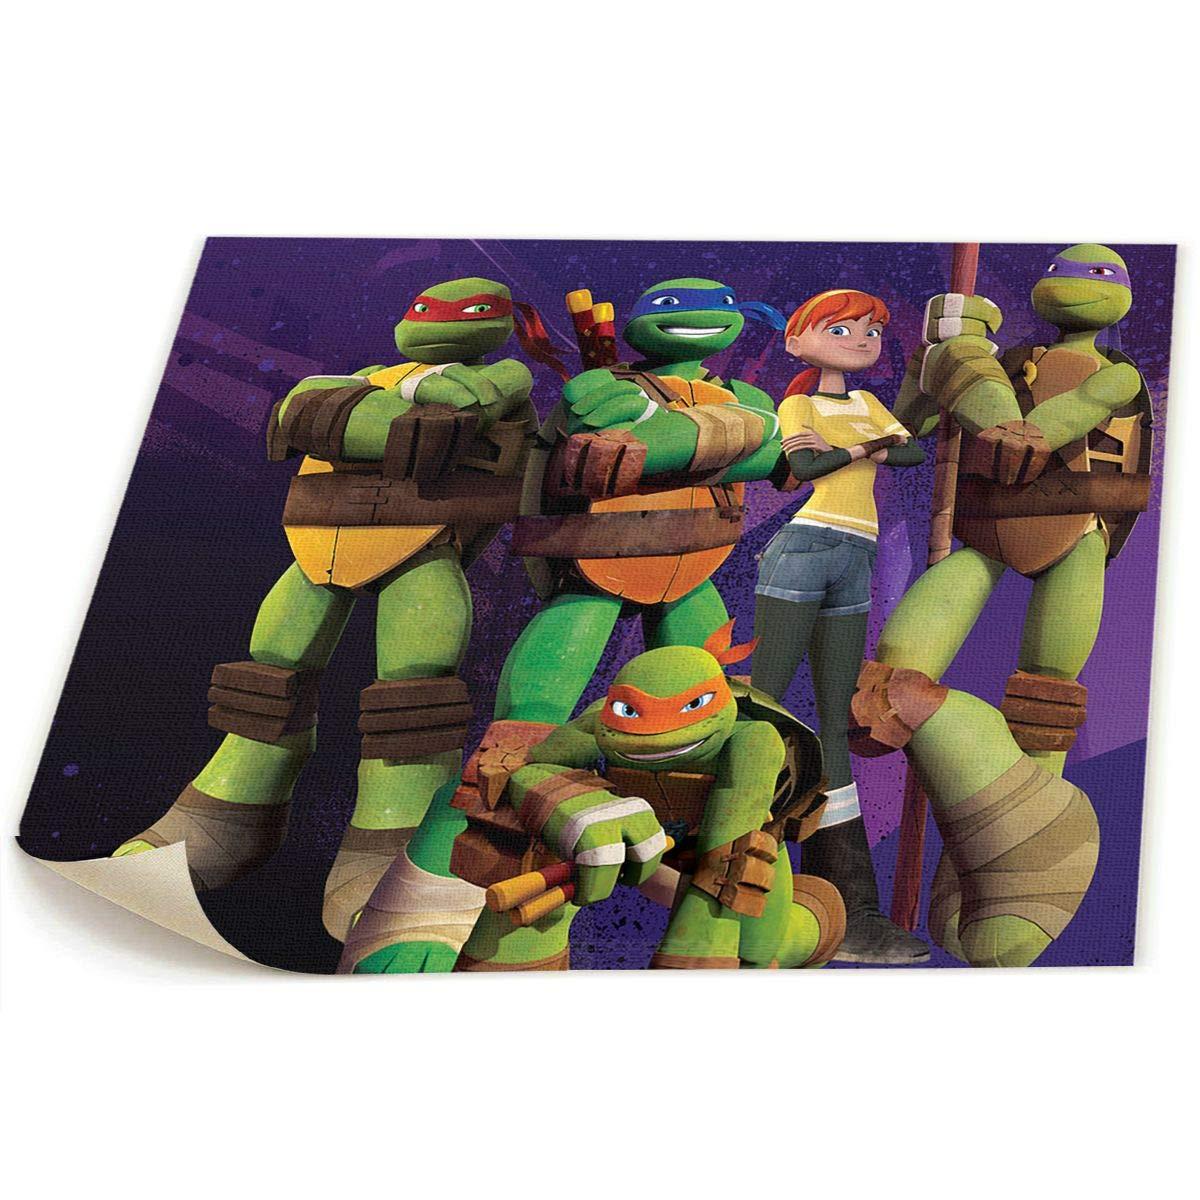 Amazon.com: HotHZ Ninja Turtle Wall Art Poster Printed On ...